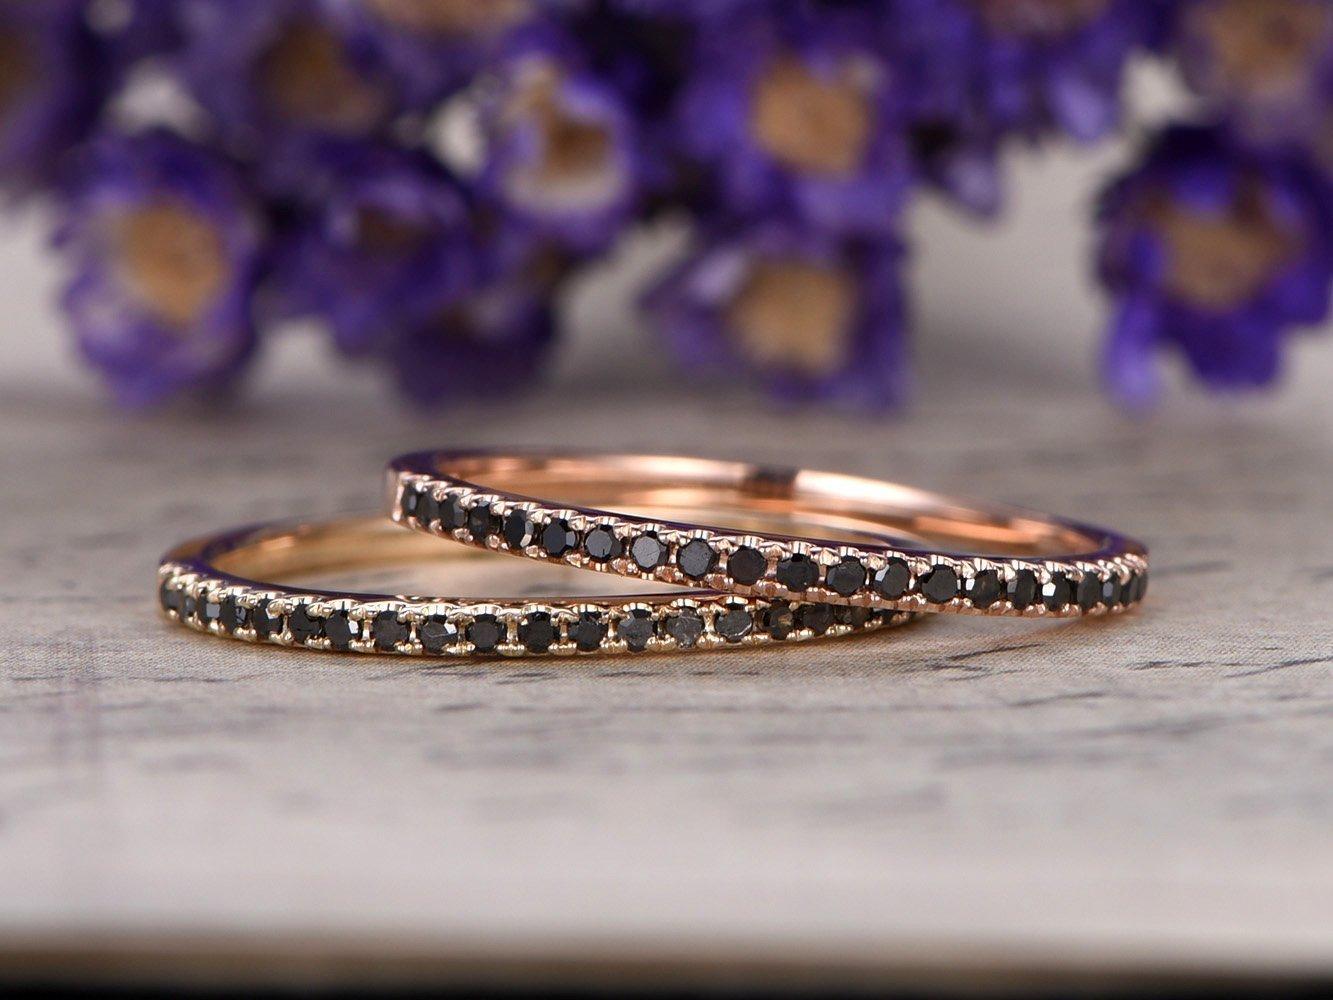 2pcs Natural Black Diamond Wedding Band Set Solid 14k Rose Gold Half Eternity Engagement Ring Bridal Anniversary Stacking Band Matching Thin Stackable Promise Sets